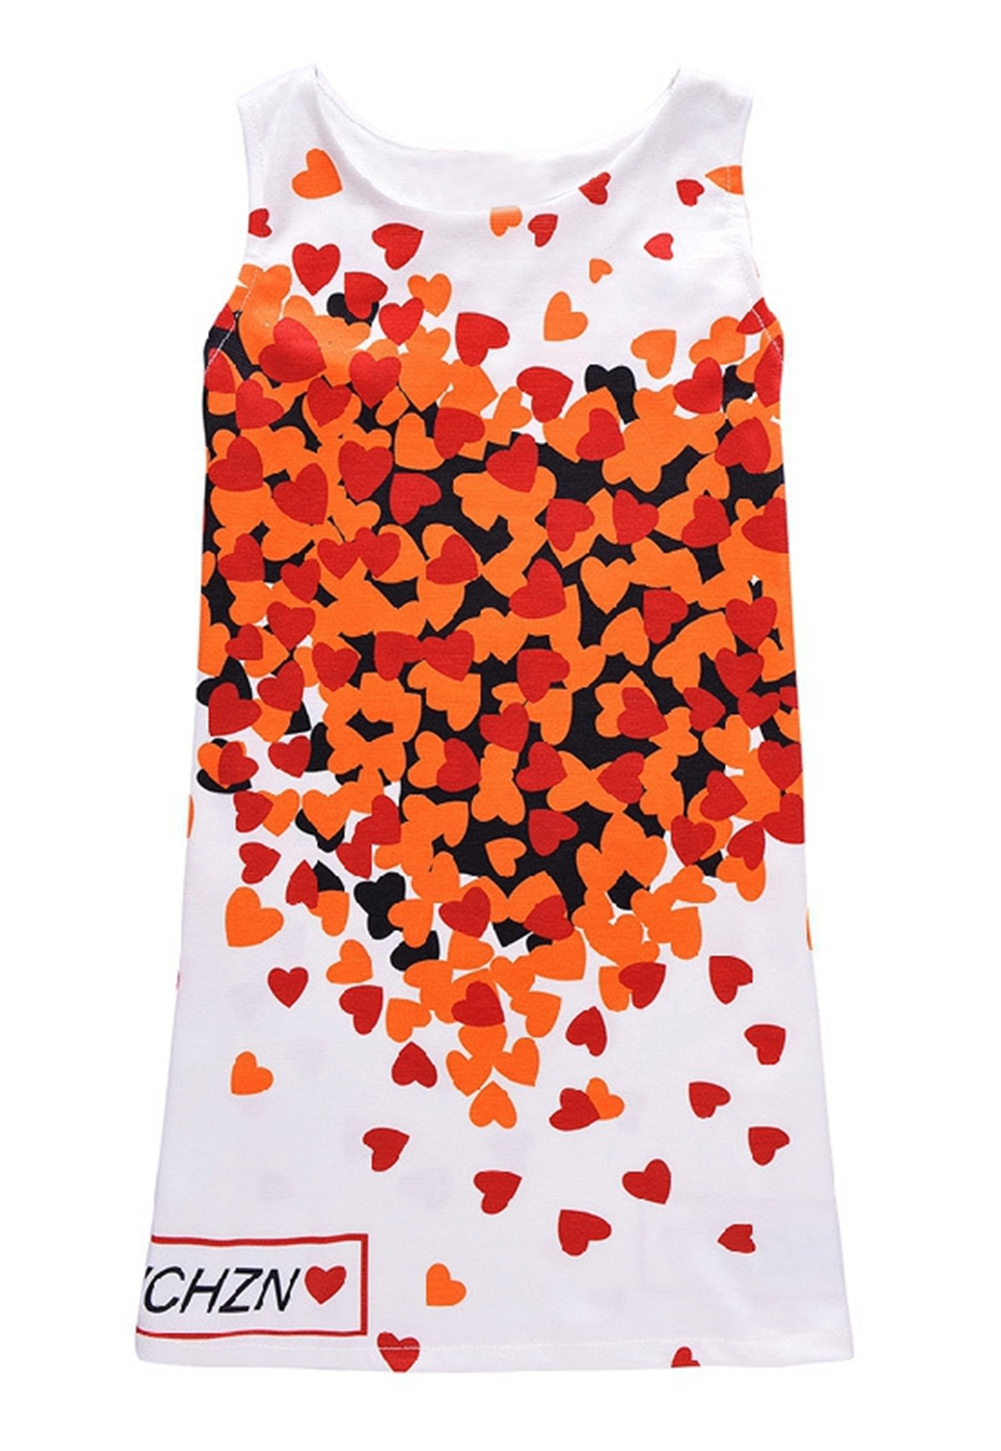 StylesILove Sweet Heart Print Sleeveless Girl Dress (130/4-5 Years)